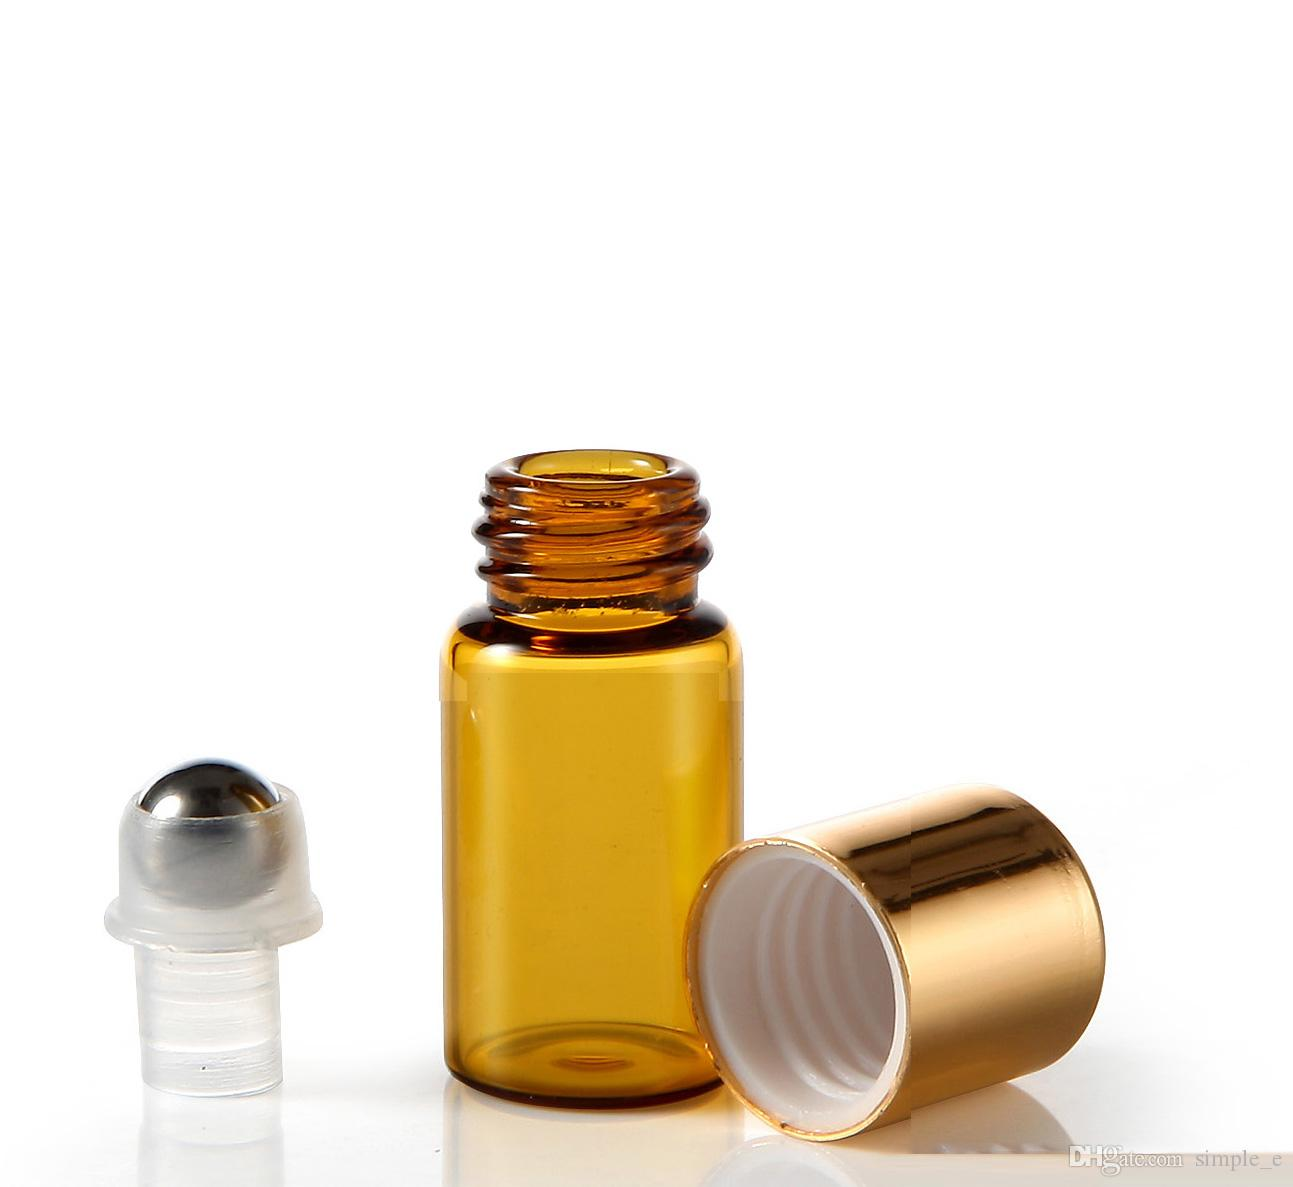 DHL./FEDEX搭載送料無料ミニ3MLブラウン琥珀色のガラスロールエッセンシャルオイル香水瓶サンプルステンレス鋼ローラーボール卸売